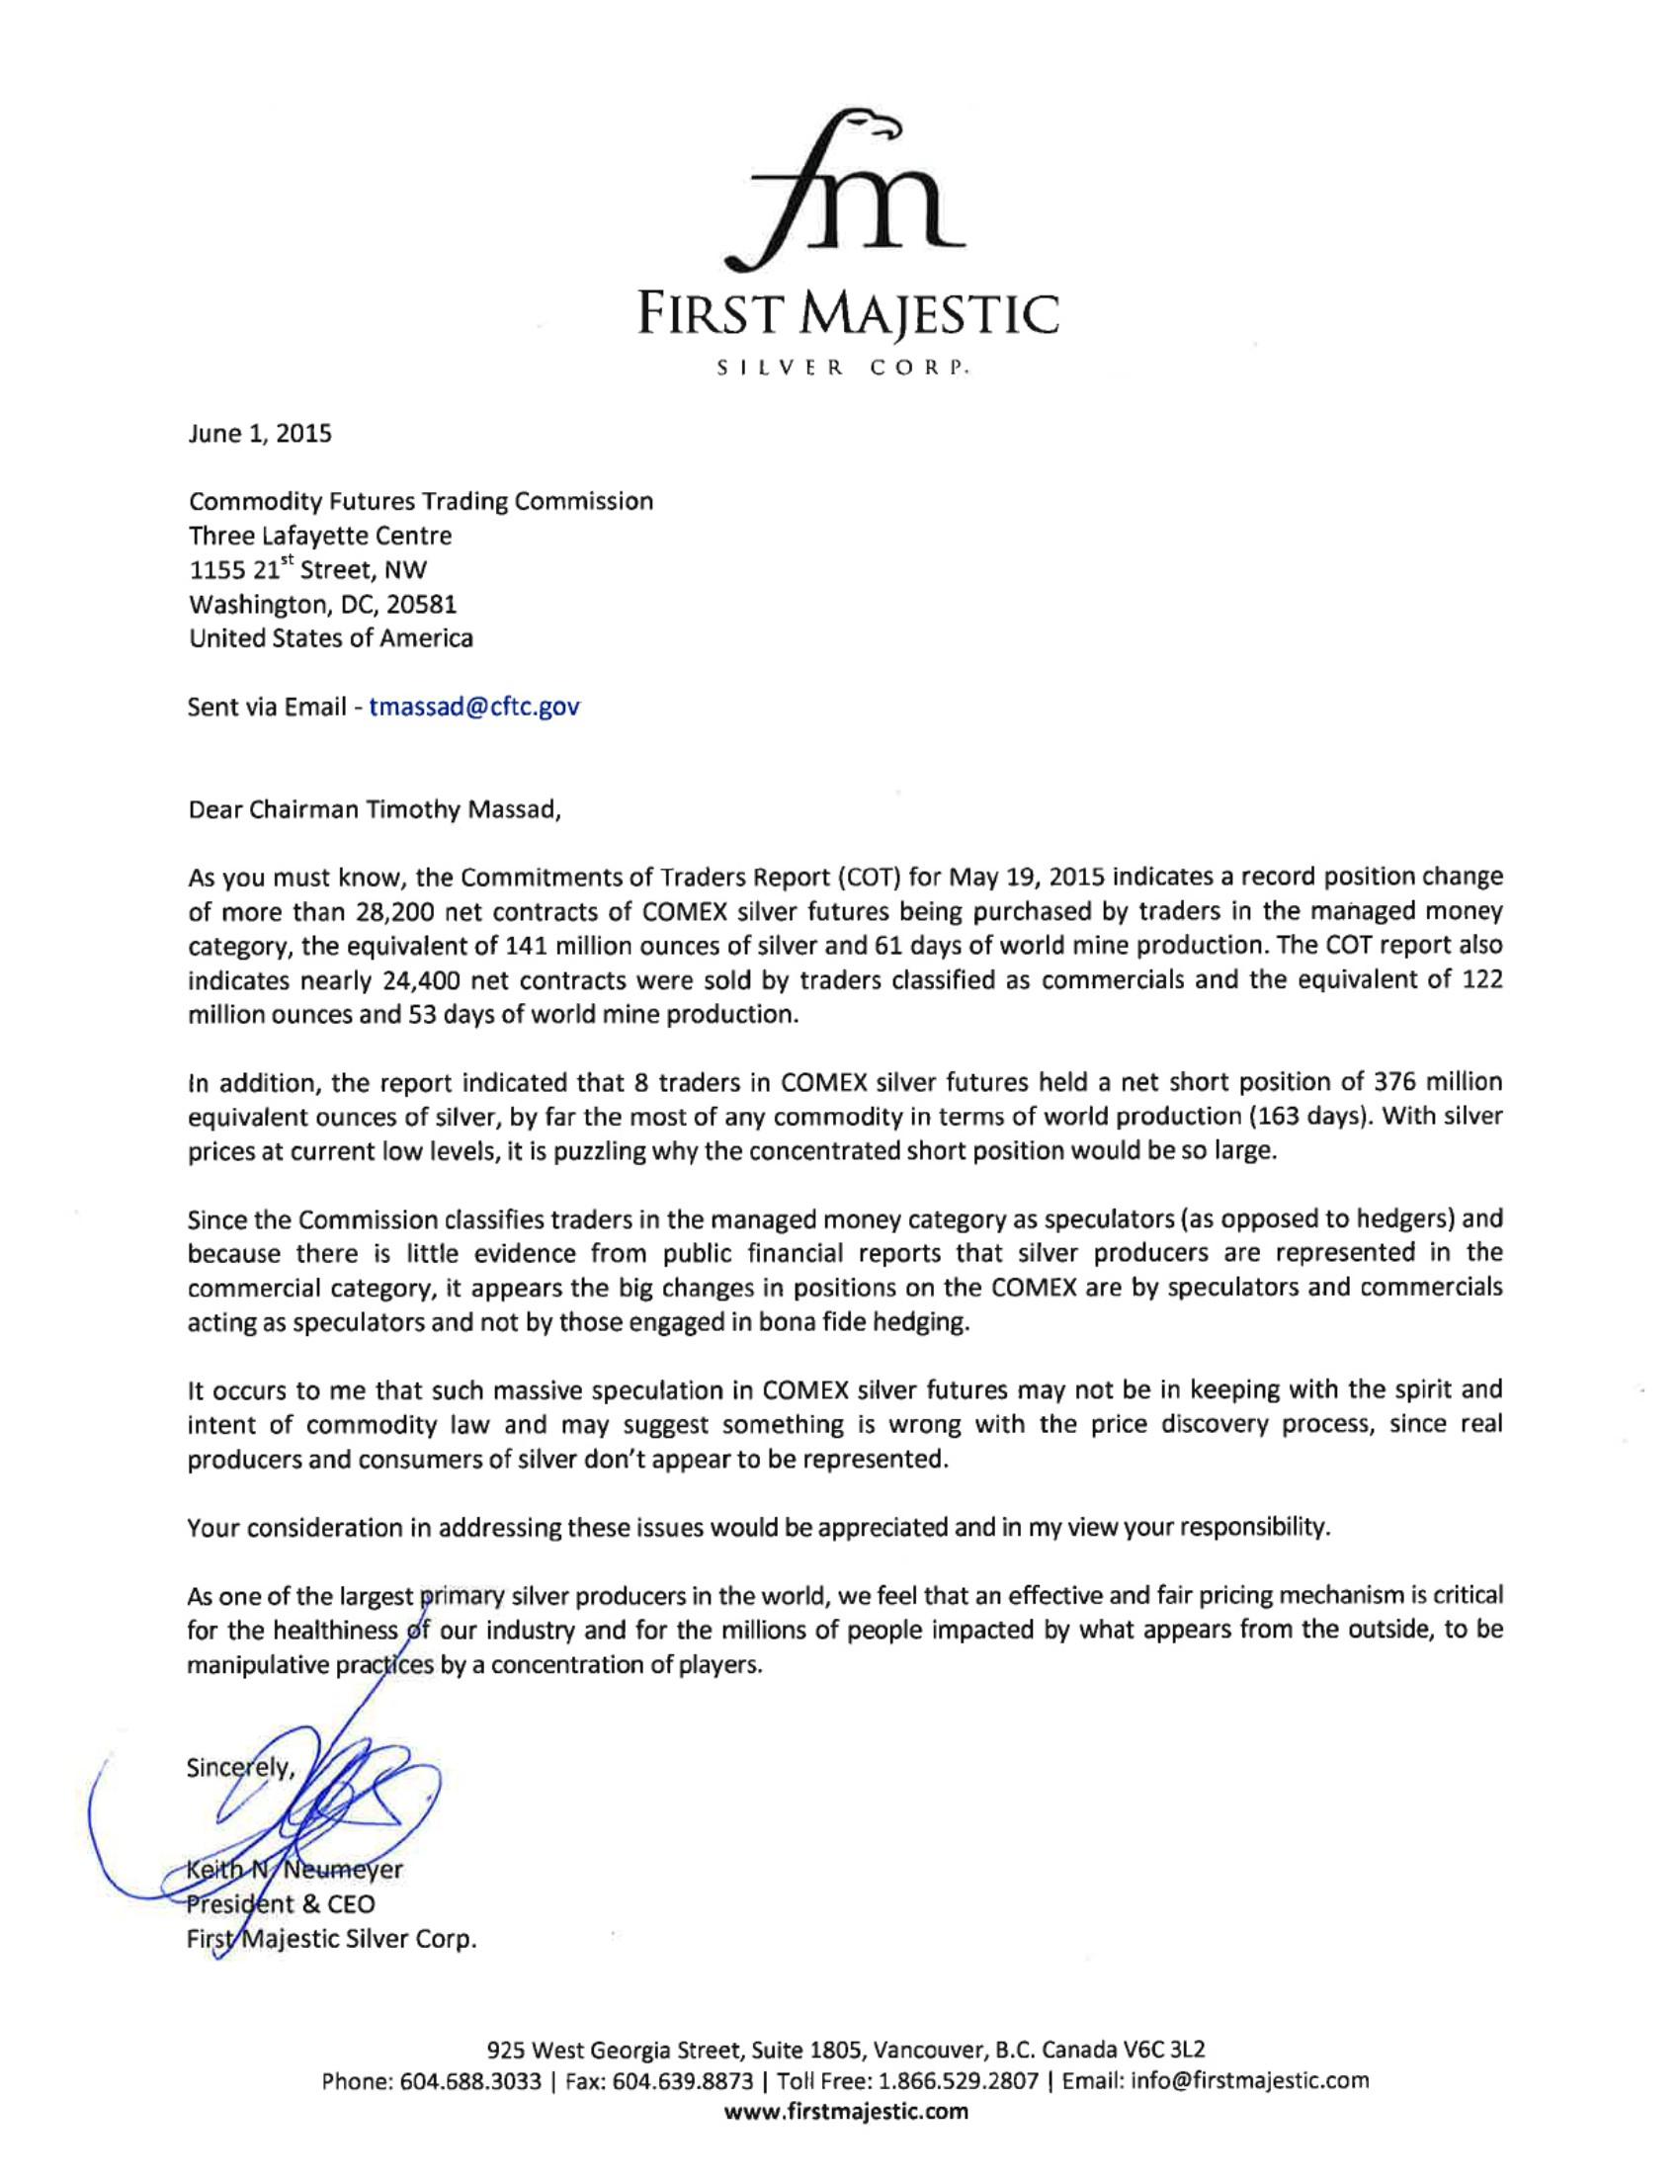 Reply to Patient Complaint Letter Template - Samples Response Letters to Customer Plaints Best Osha Plaint